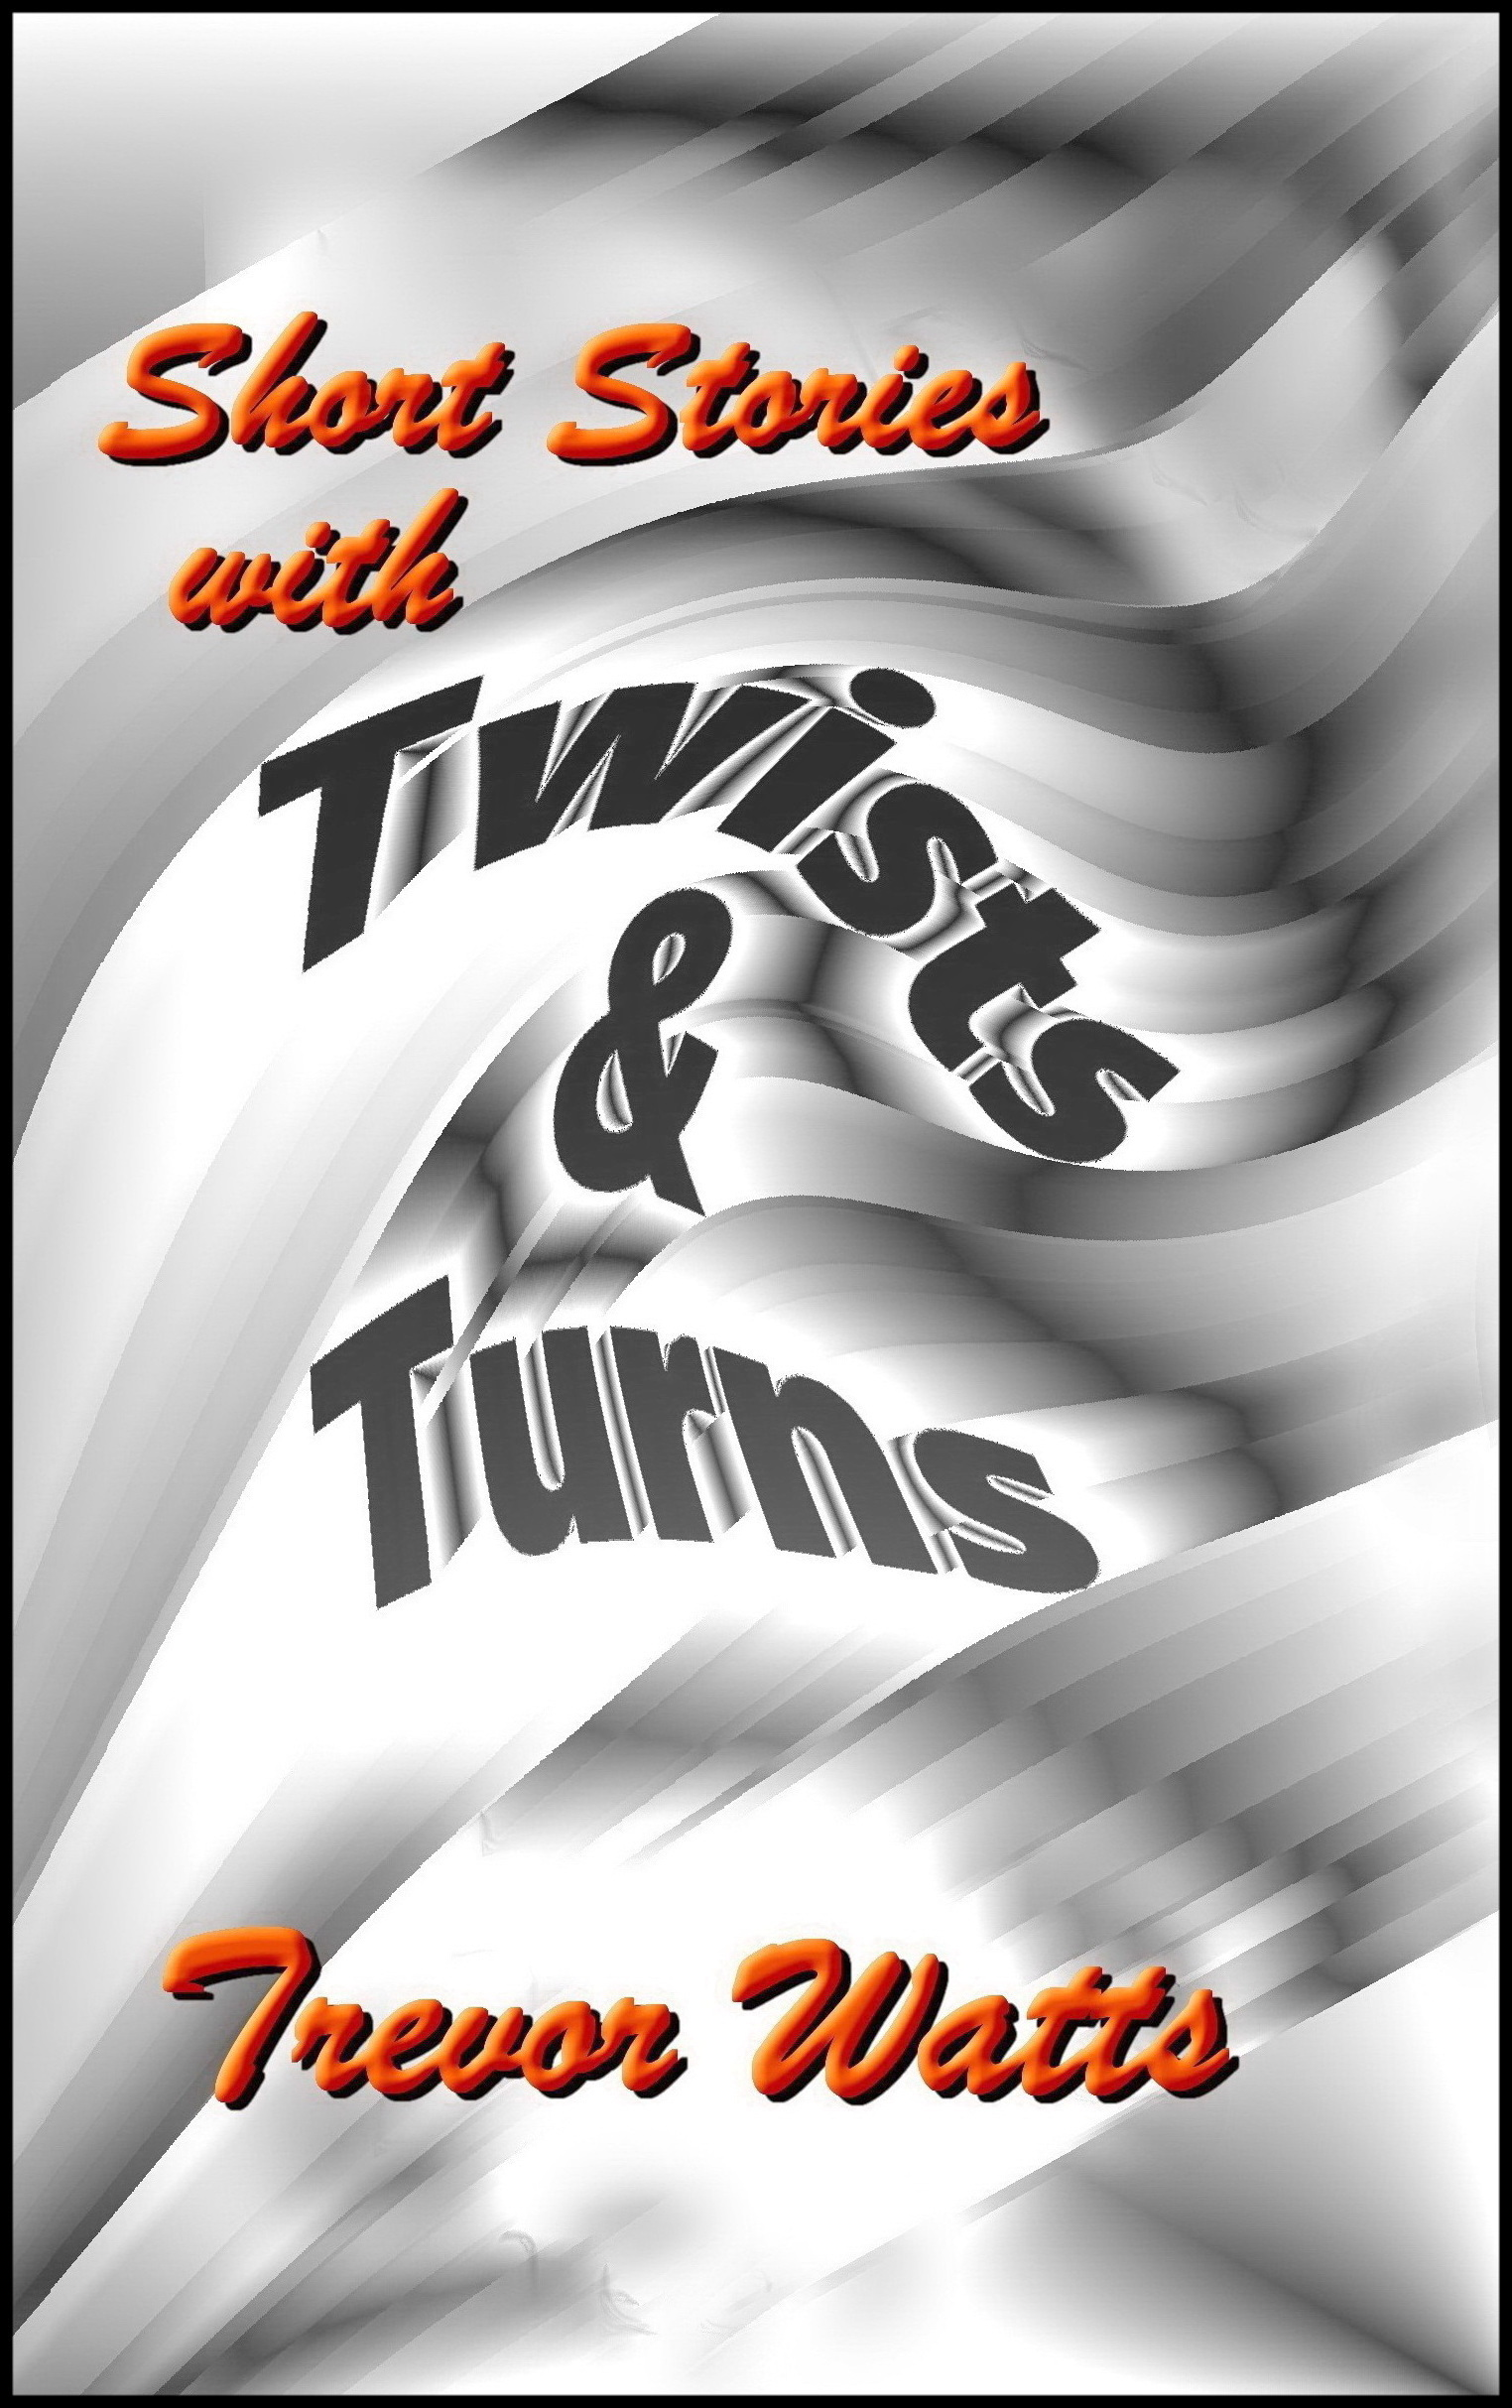 Of Twists & Turns